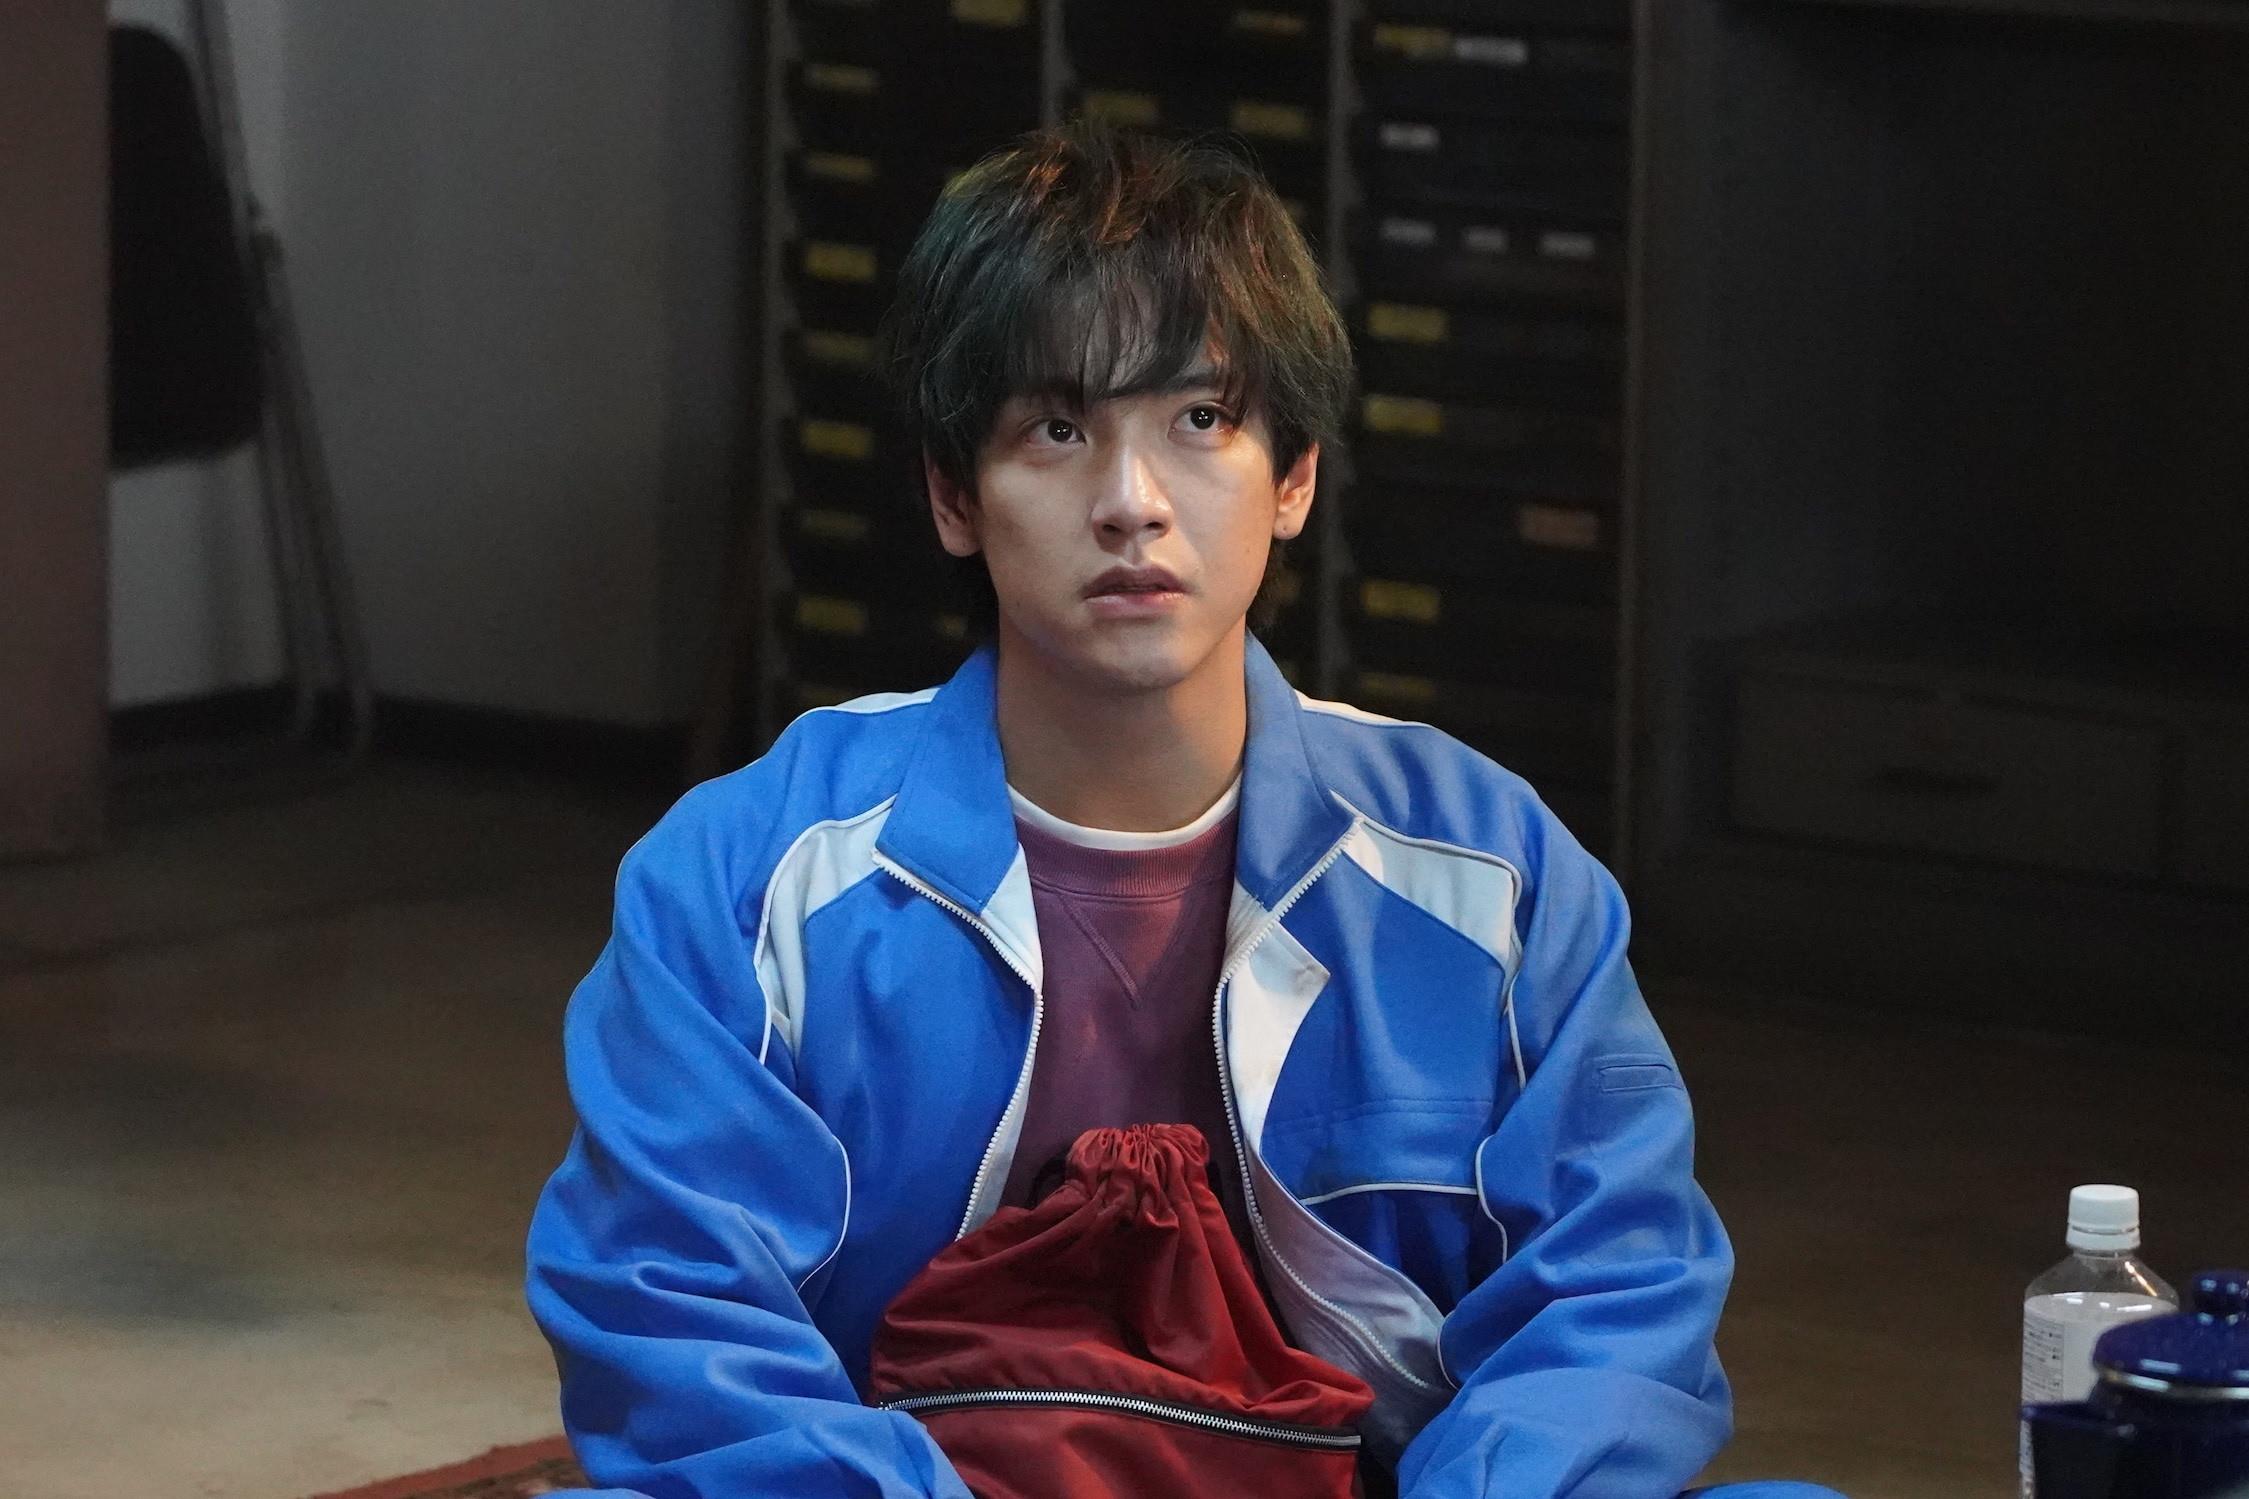 N.Flyingのジェヒョンさんが、日本のドラマ「君と世界が終わる日に」で魅力を発揮!_1_4-5